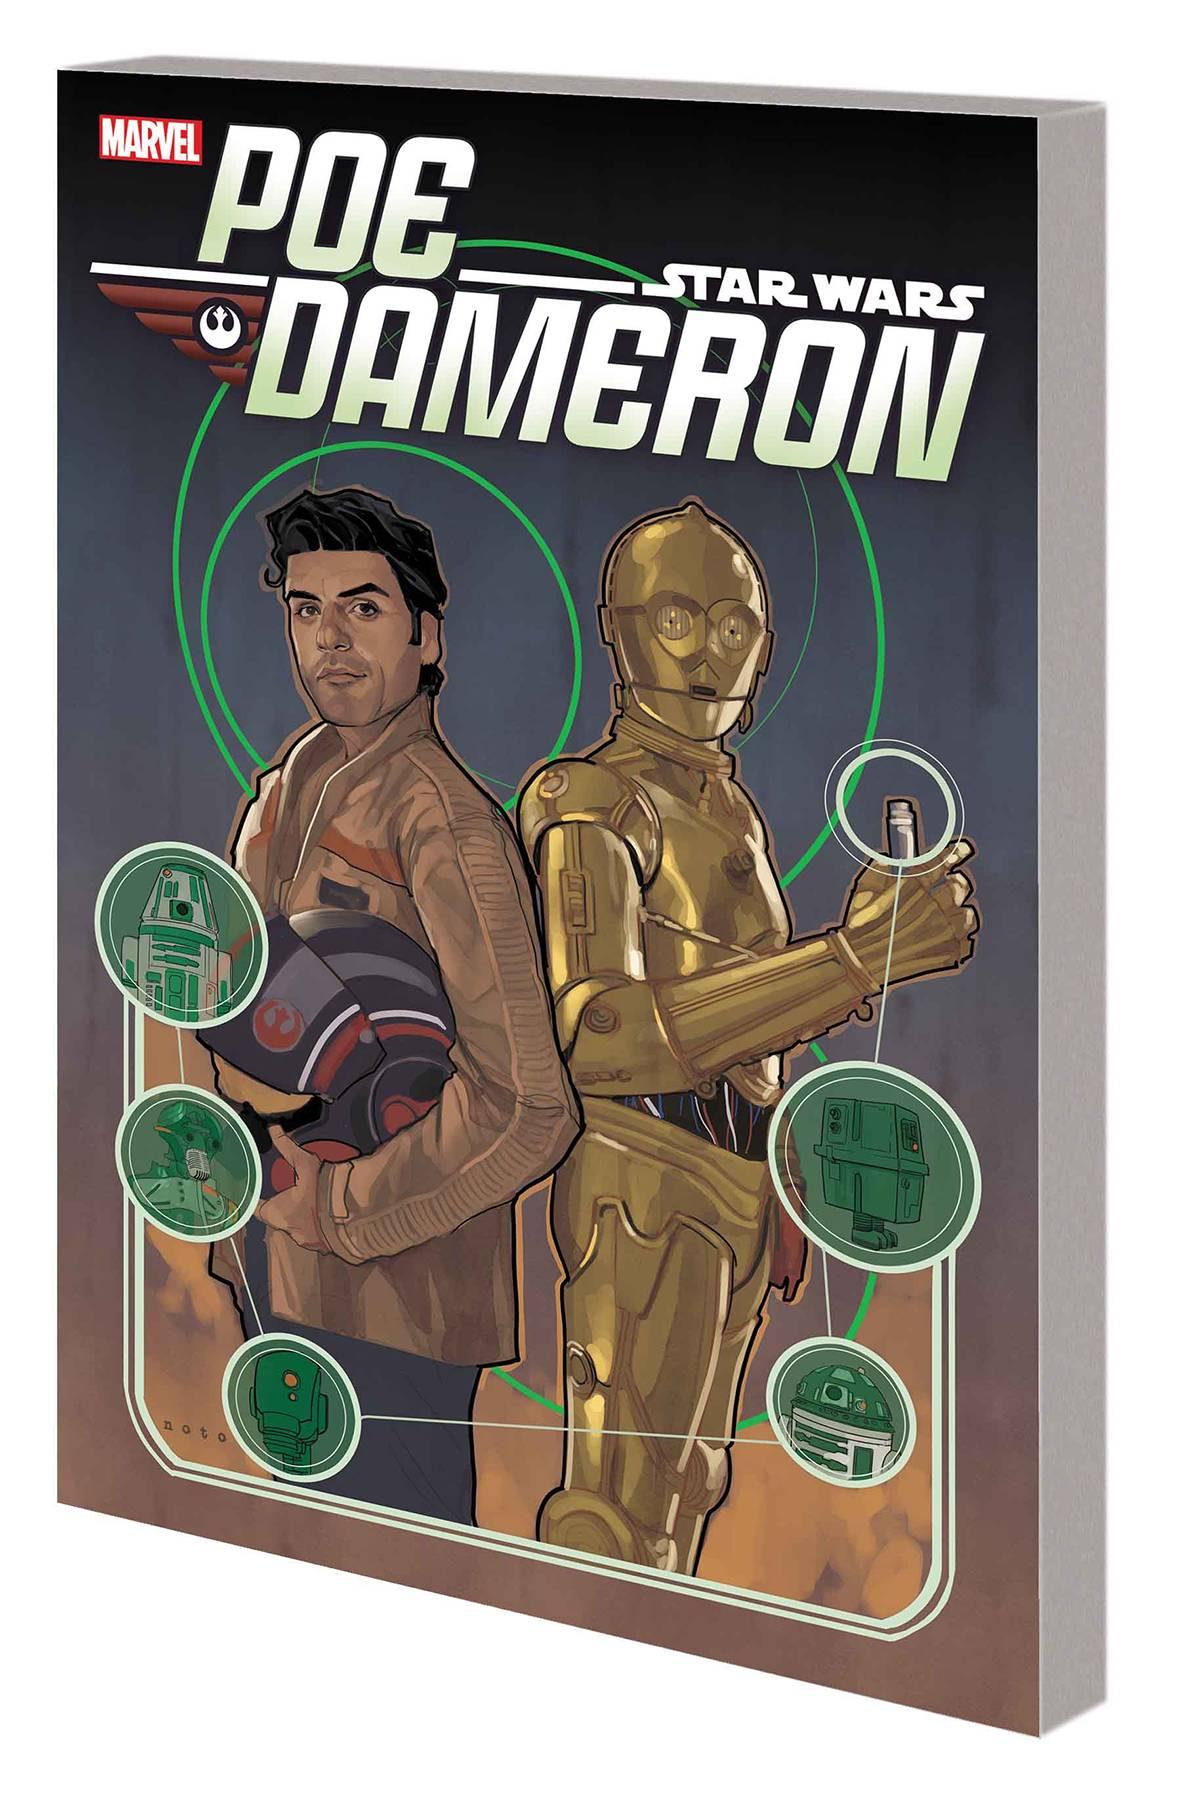 Star Wars Poe Dameron Tp Vol 02 Gathering Storm